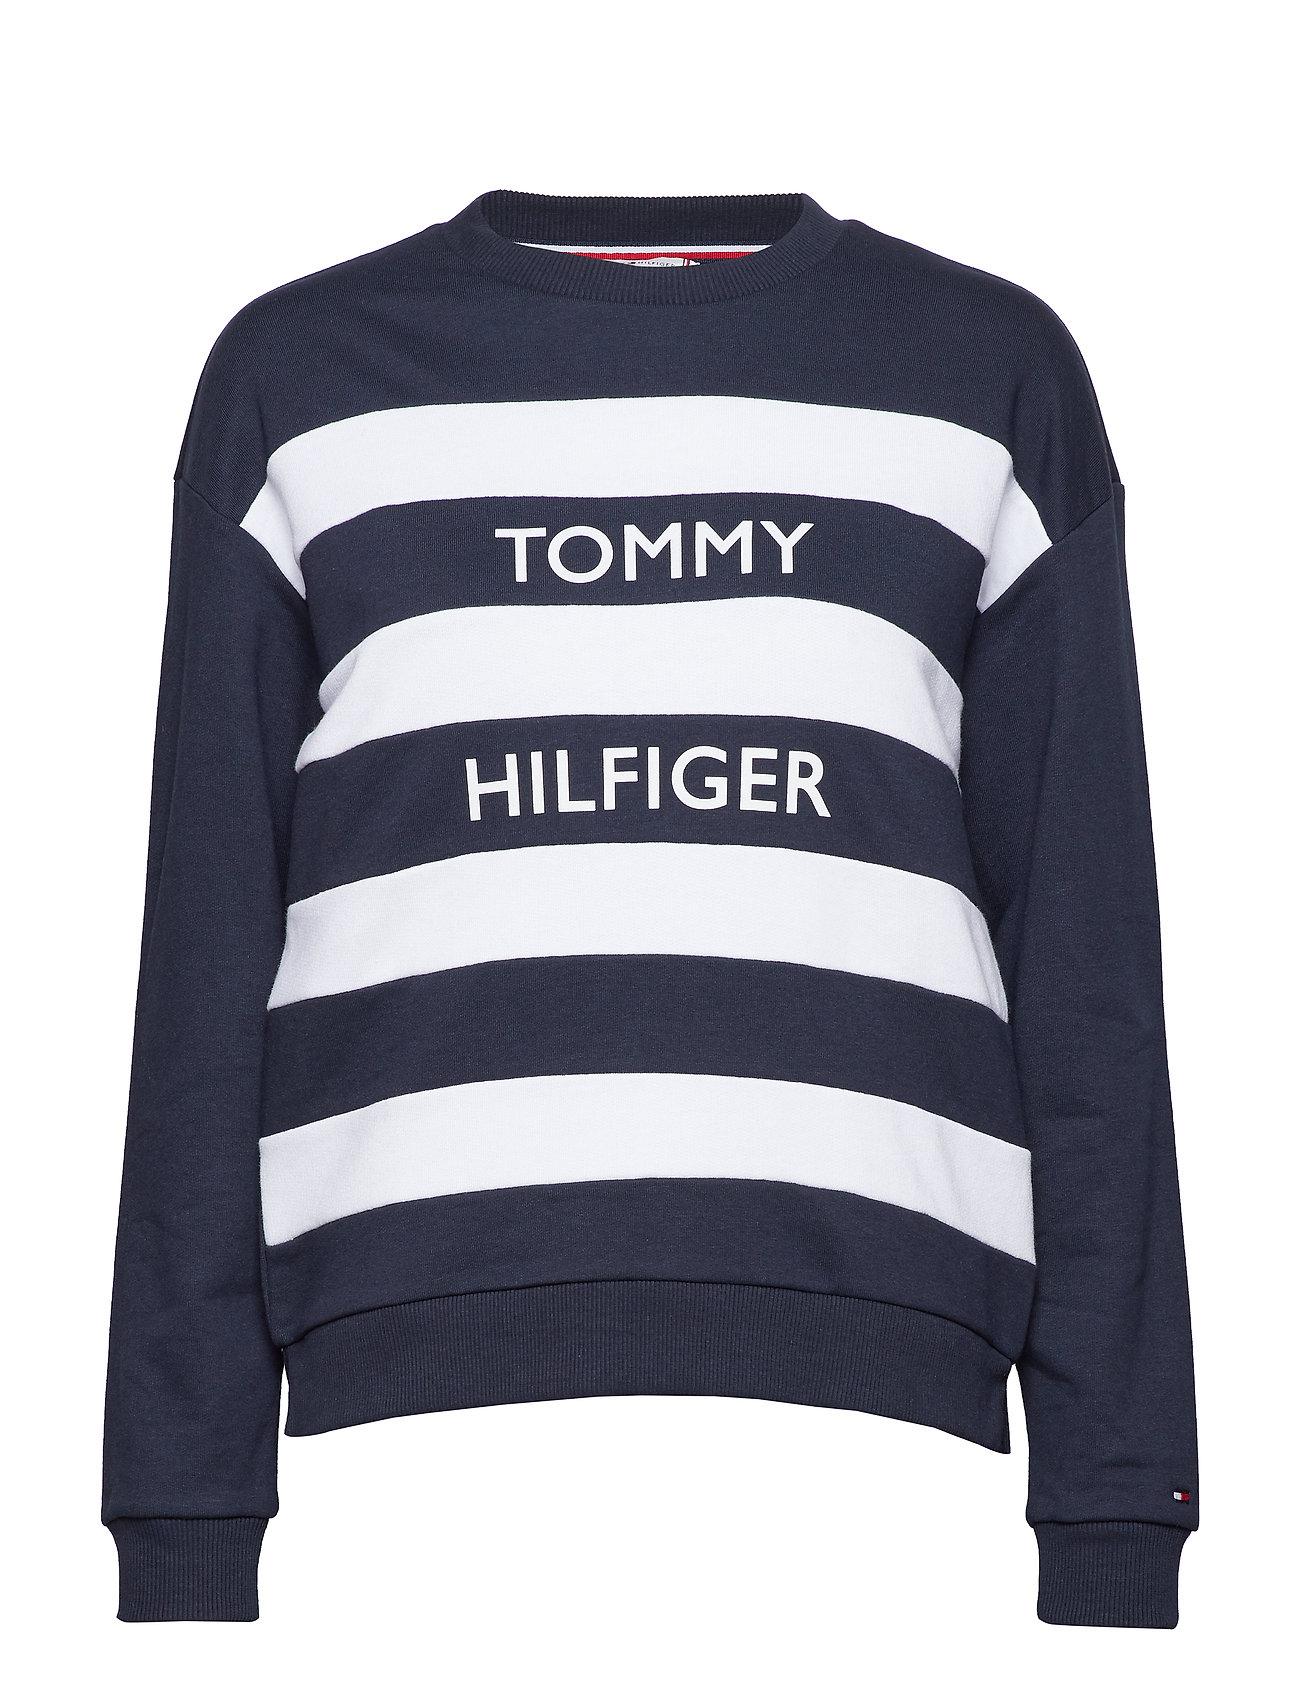 Tommy Hilfiger KENDRA C-NK SWEATSHI - MIDNIGHT / CL. WHITE